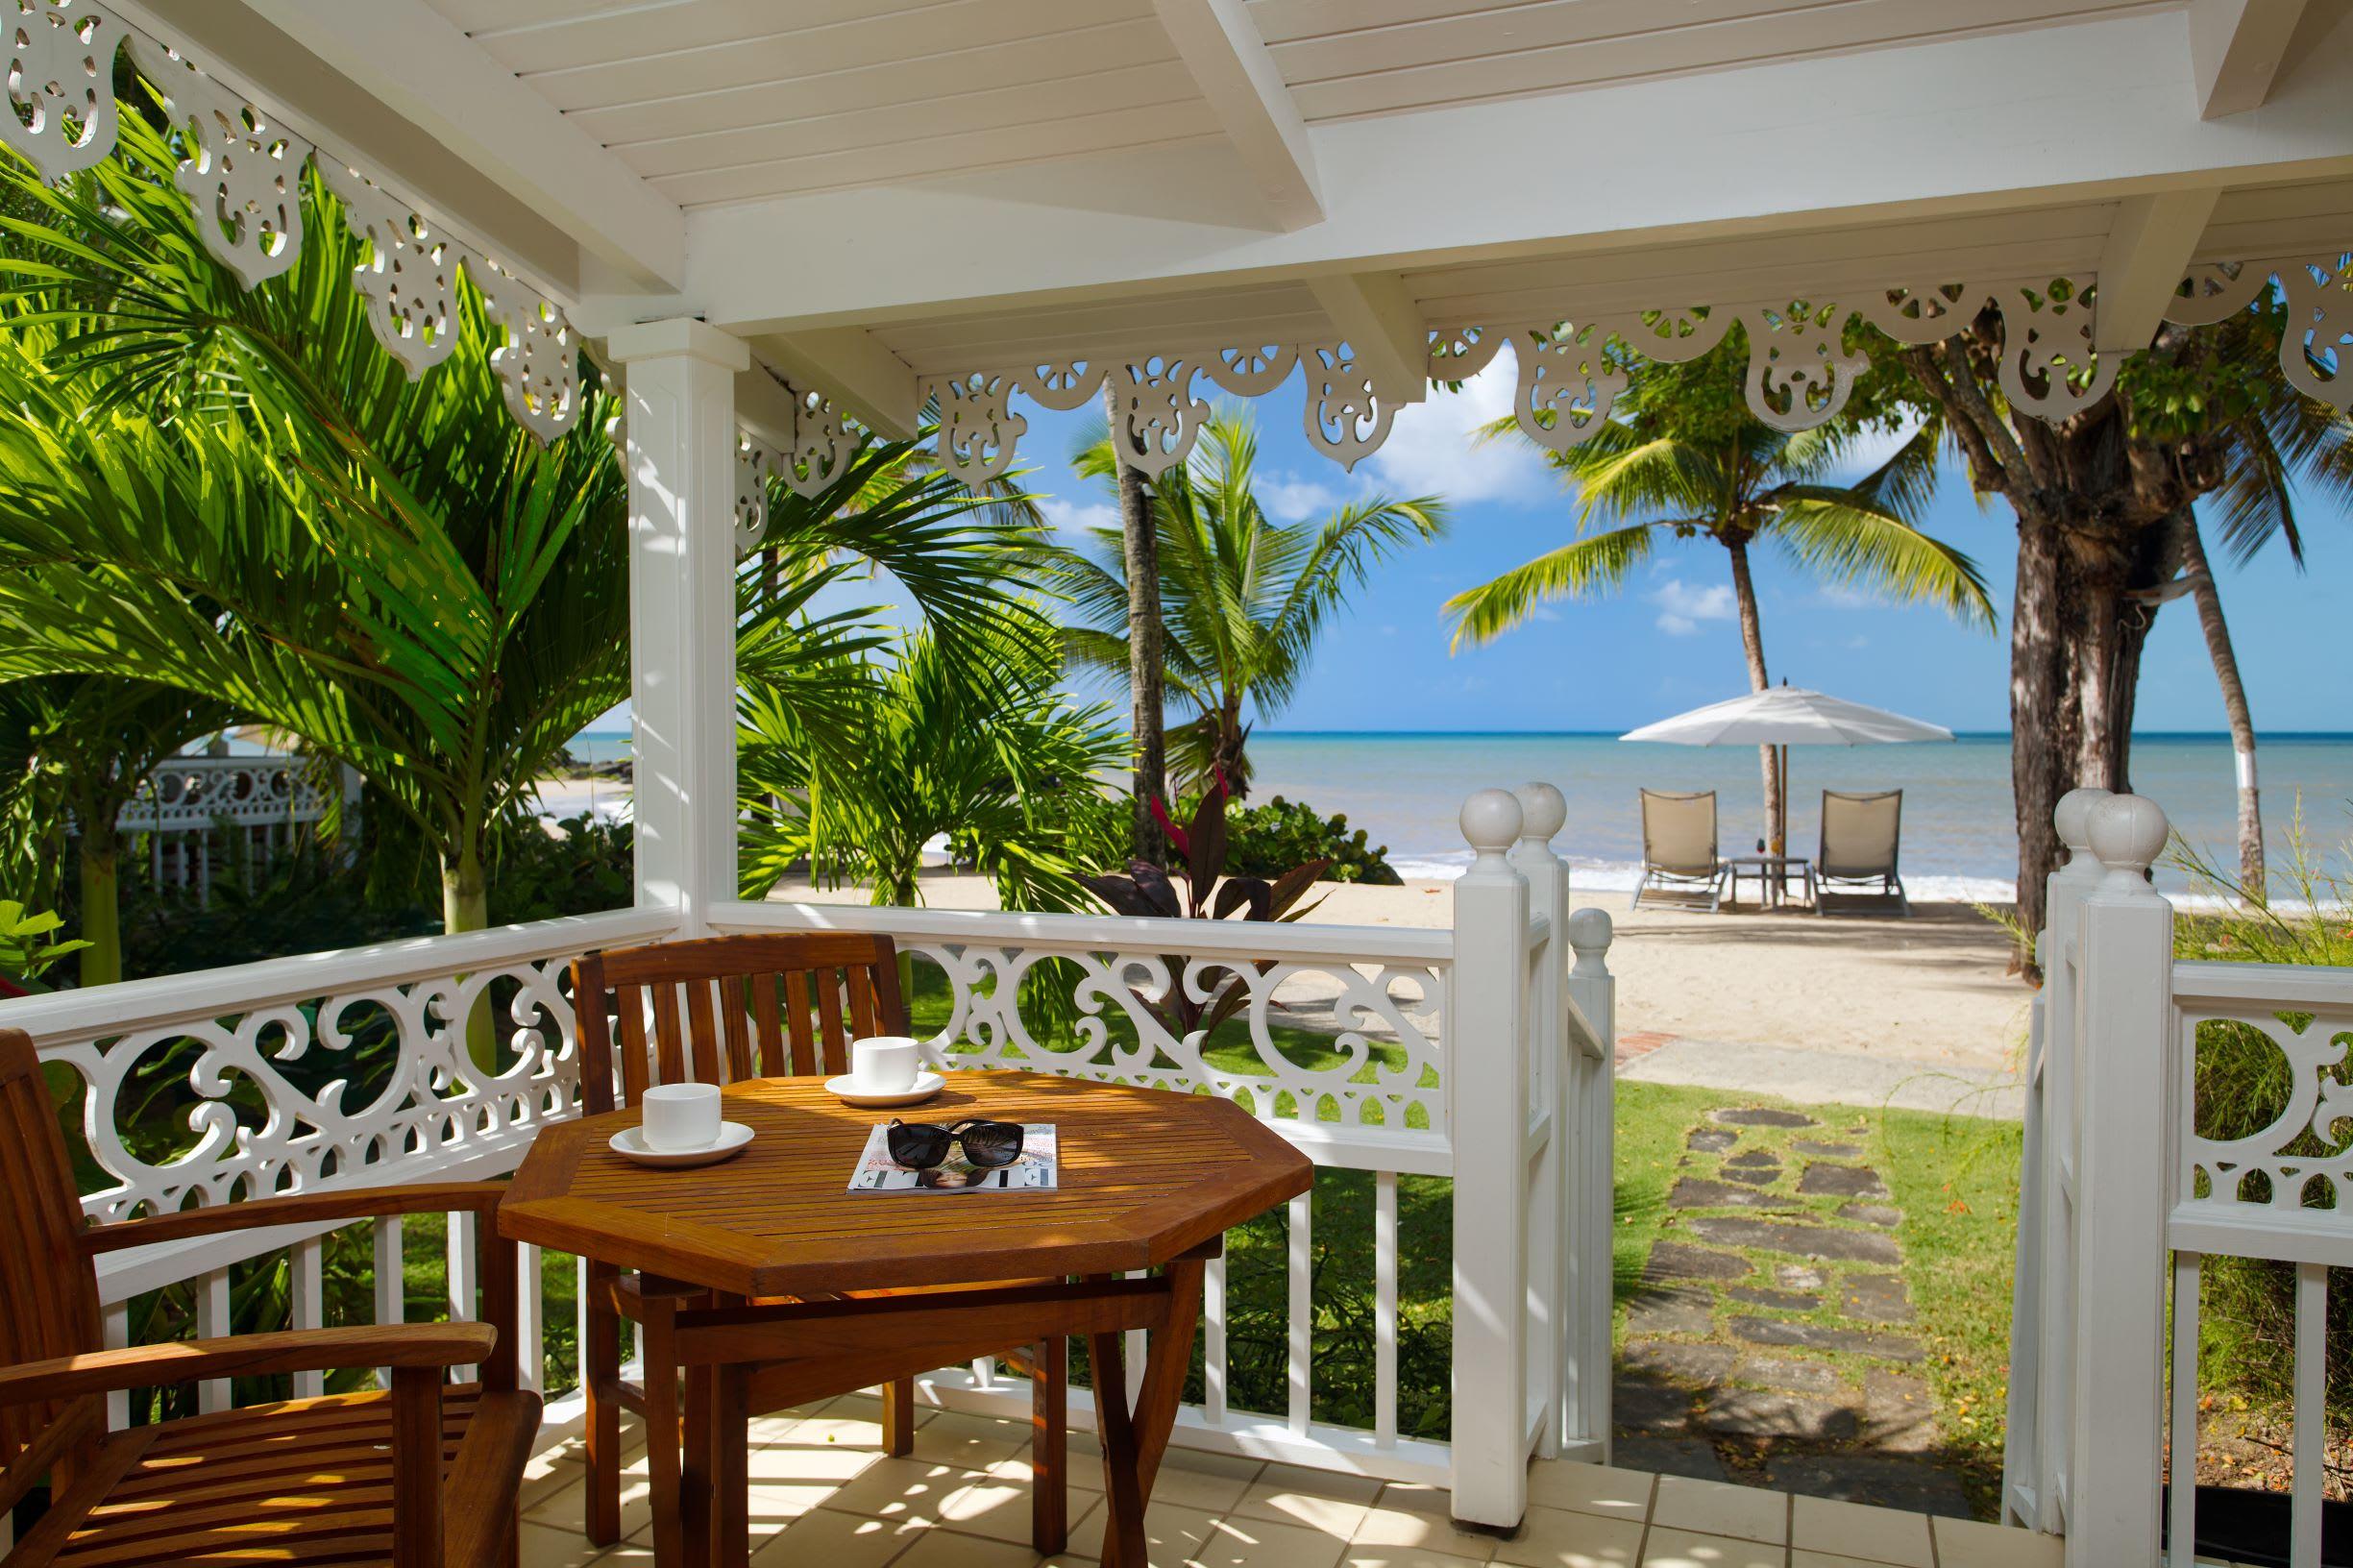 Beach cottage view